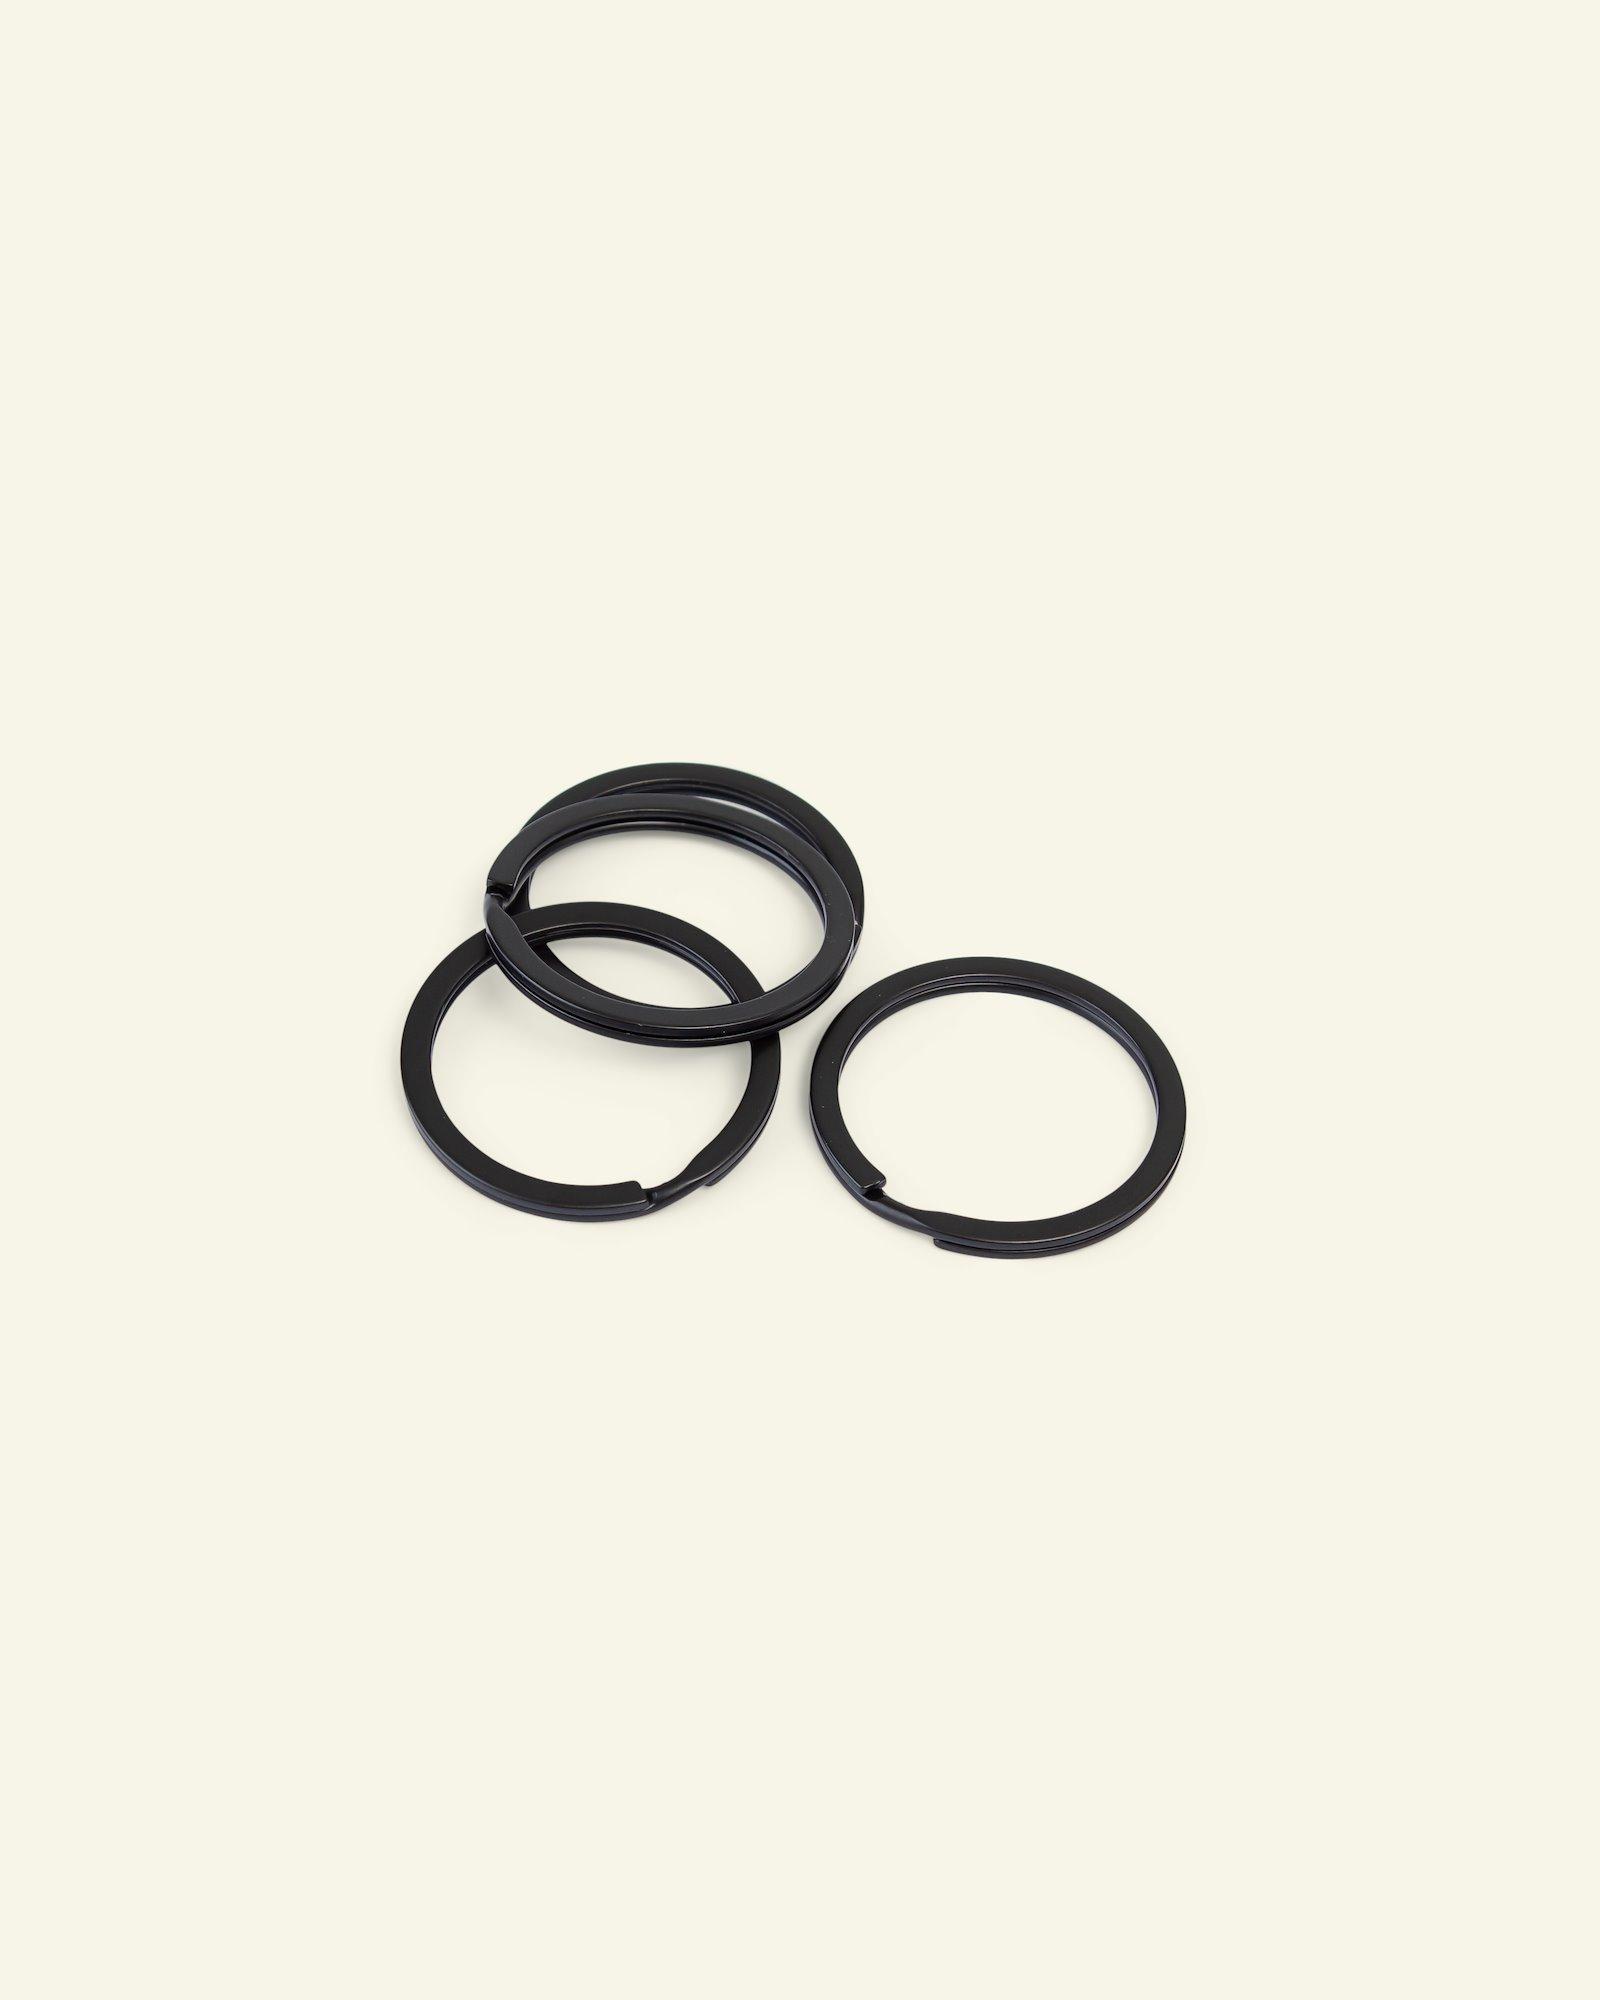 Key ring flat metal 30mm dull black 4pcs